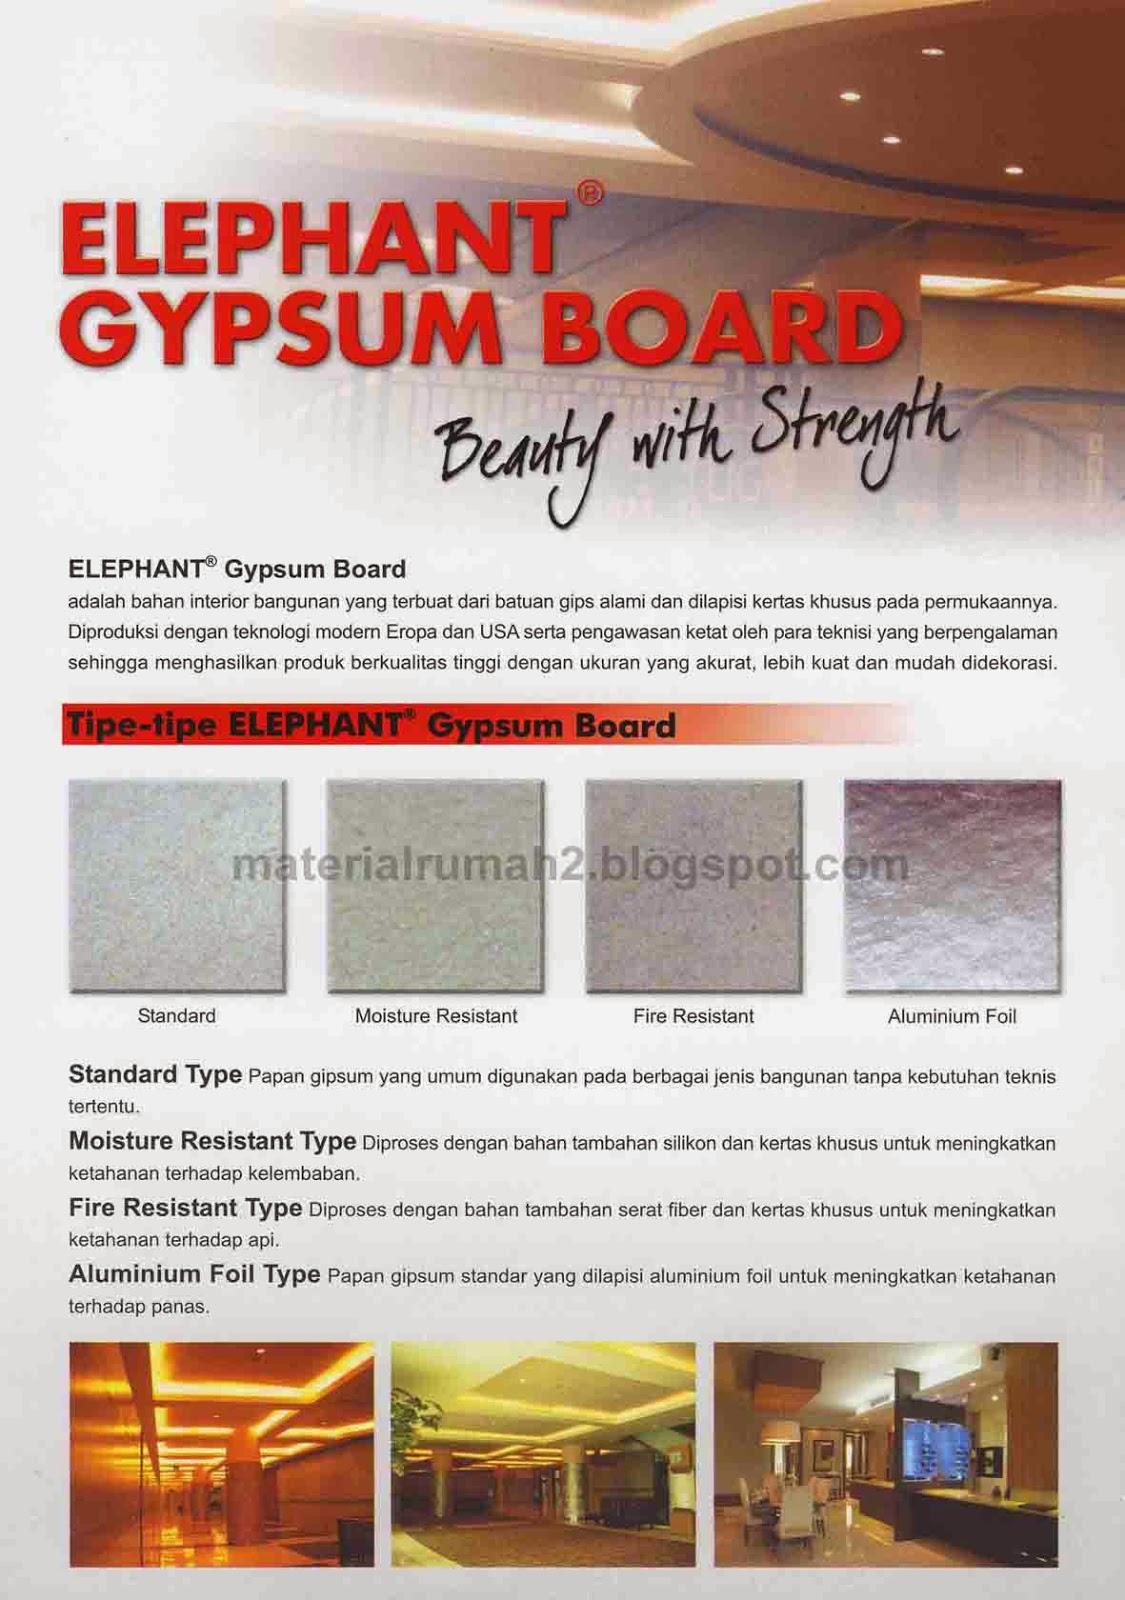 Tipe Produk ELEPHANT GYPSUM BOARD